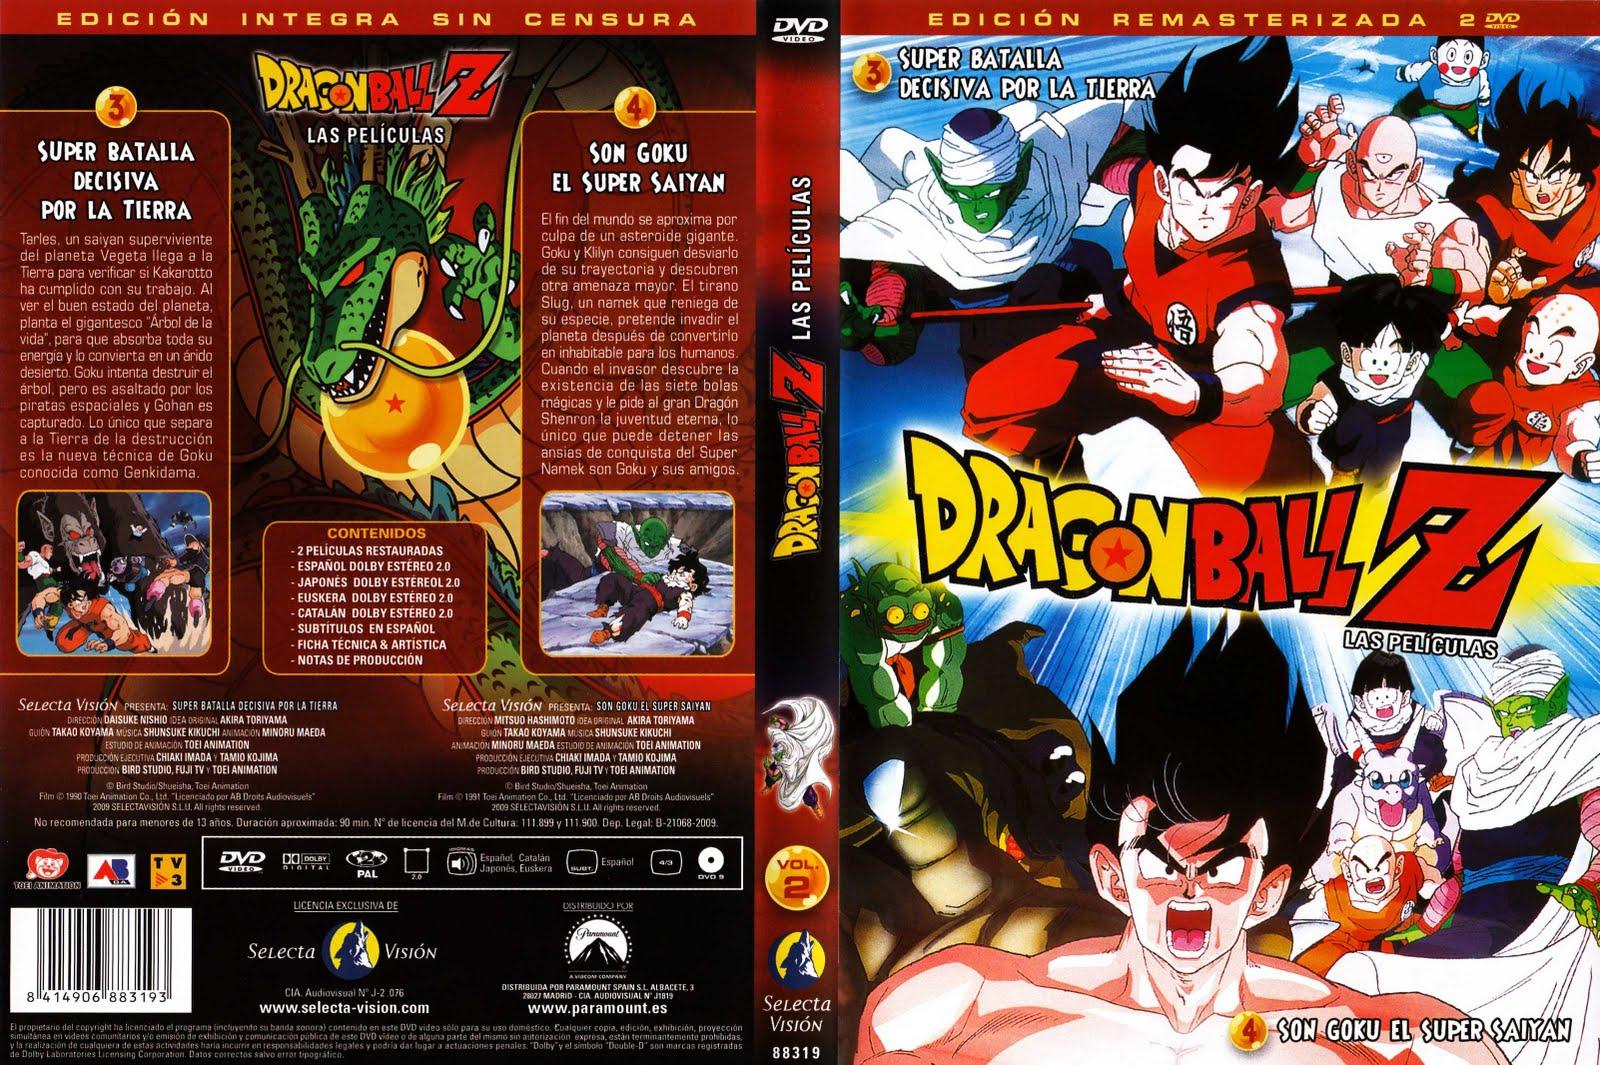 Etiquetas: Caratulas DVD Dragon Ball Z Las Peliculas Selecta Vision